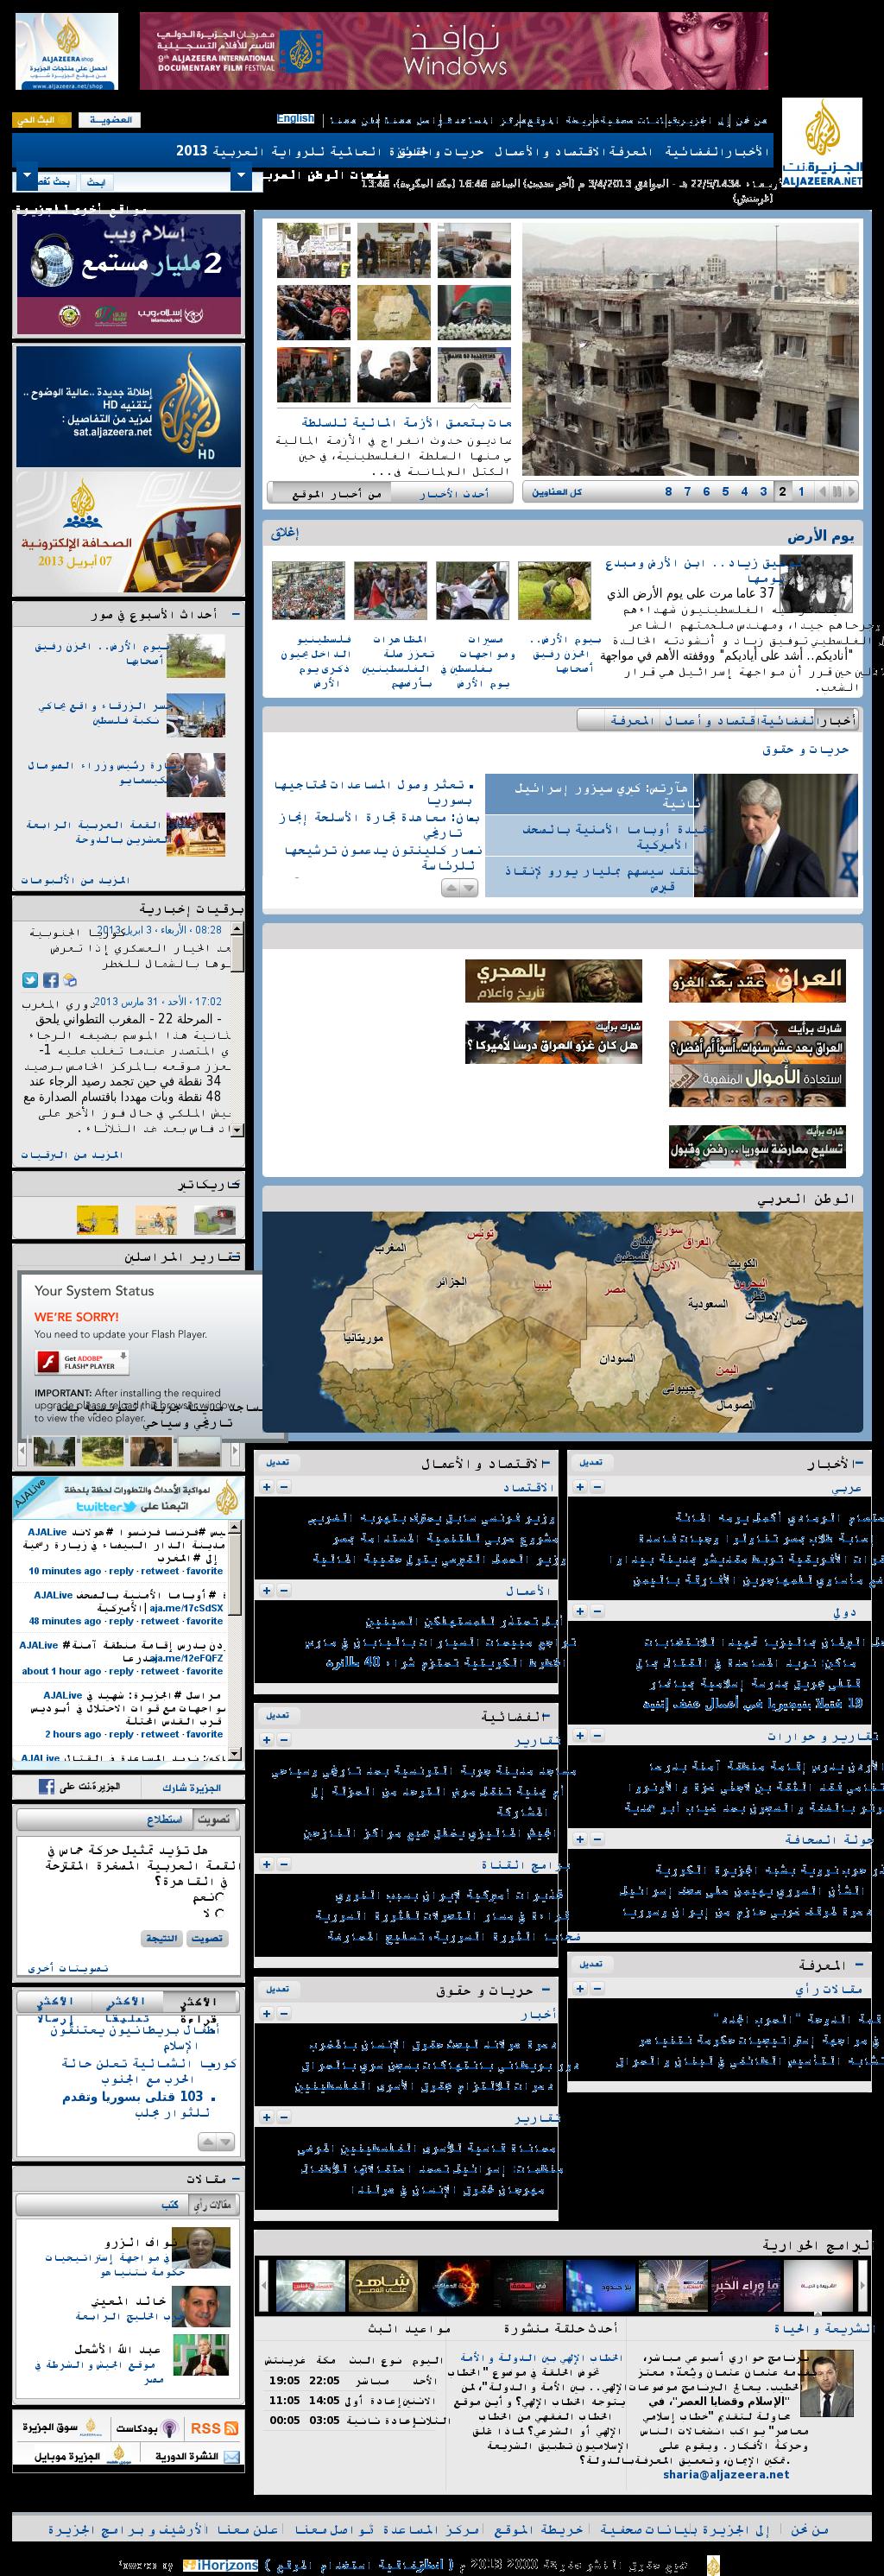 Al Jazeera at Wednesday April 3, 2013, 2:11 p.m. UTC